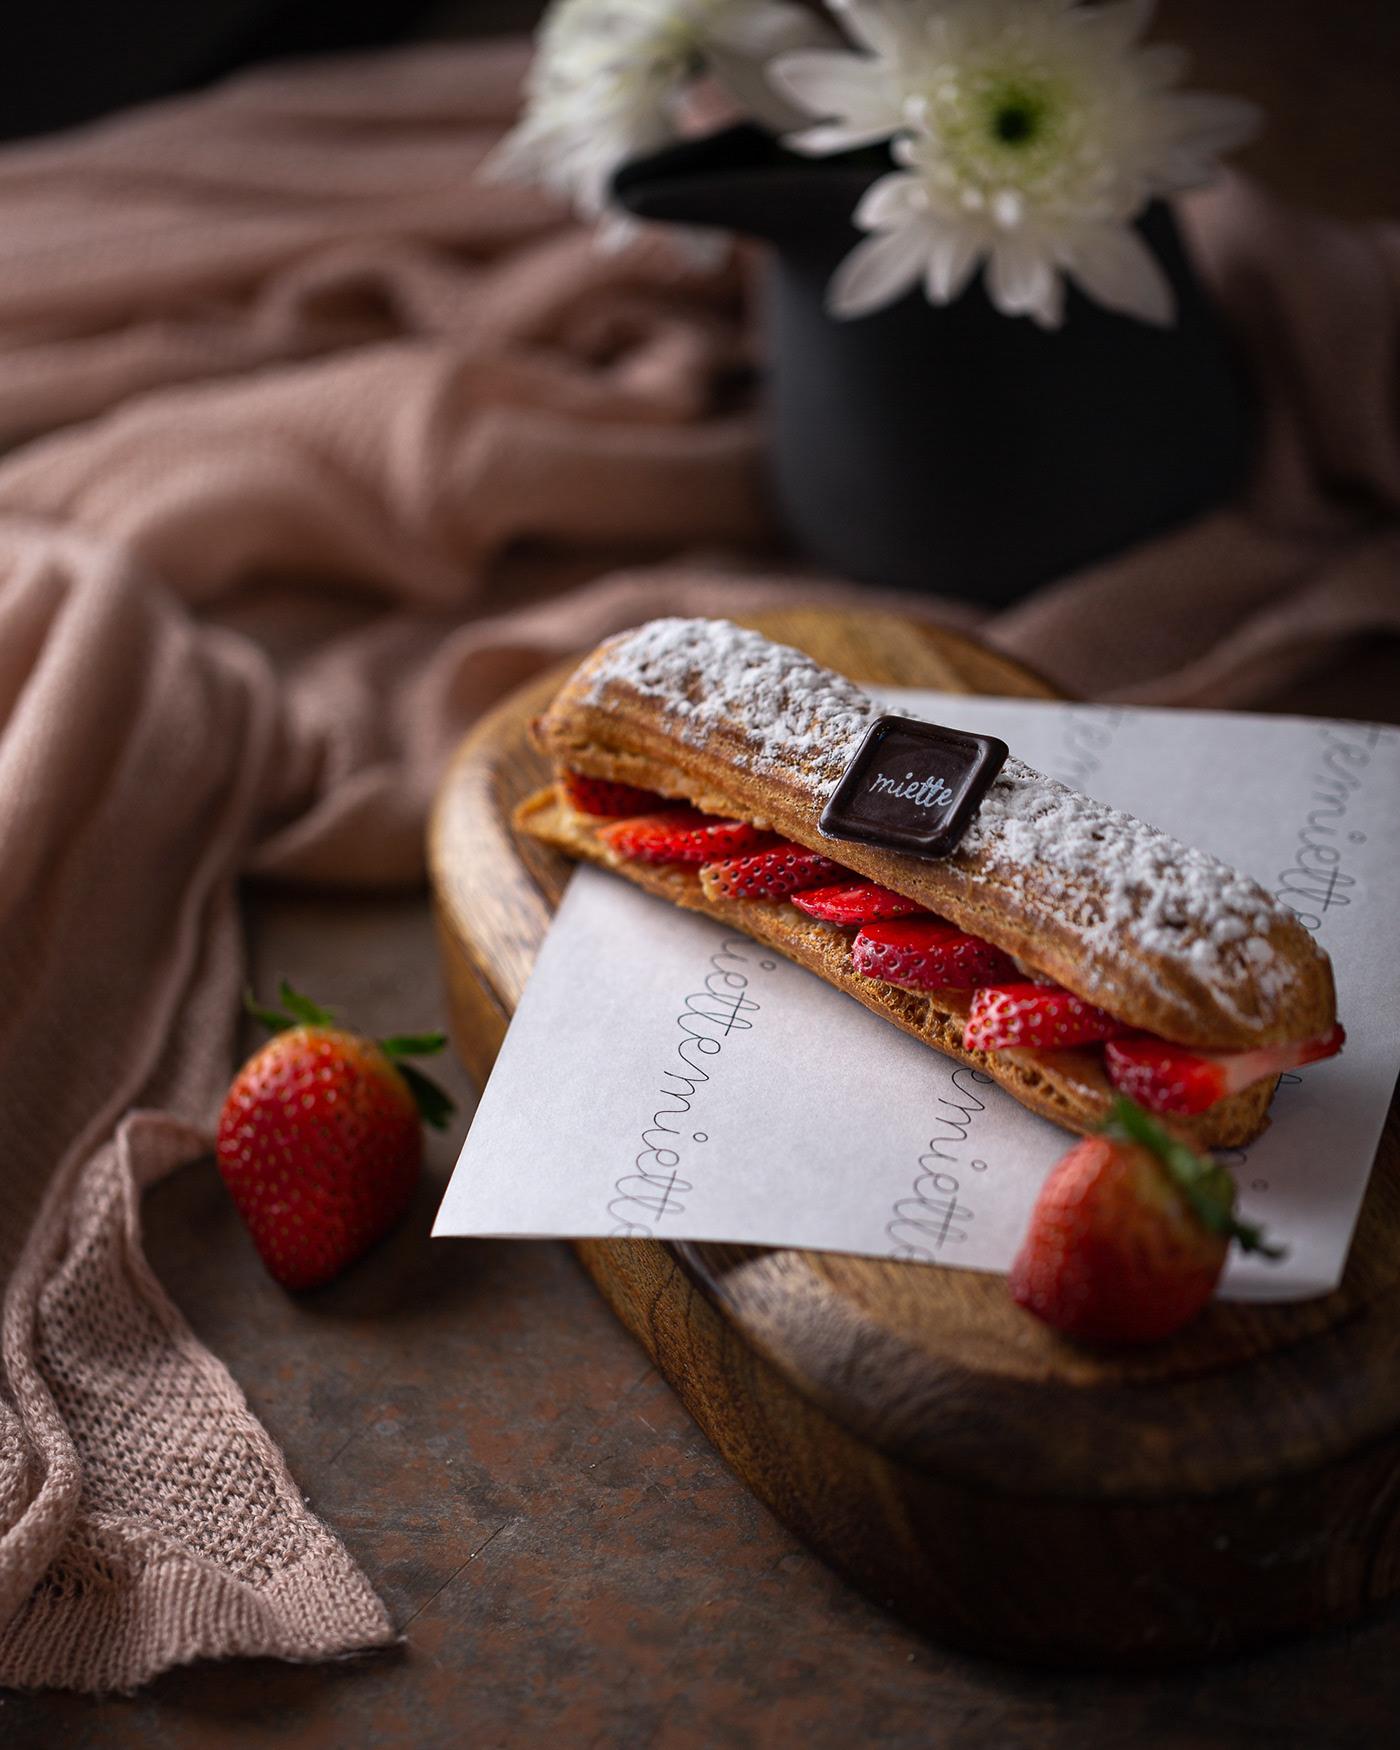 Miette Bakery